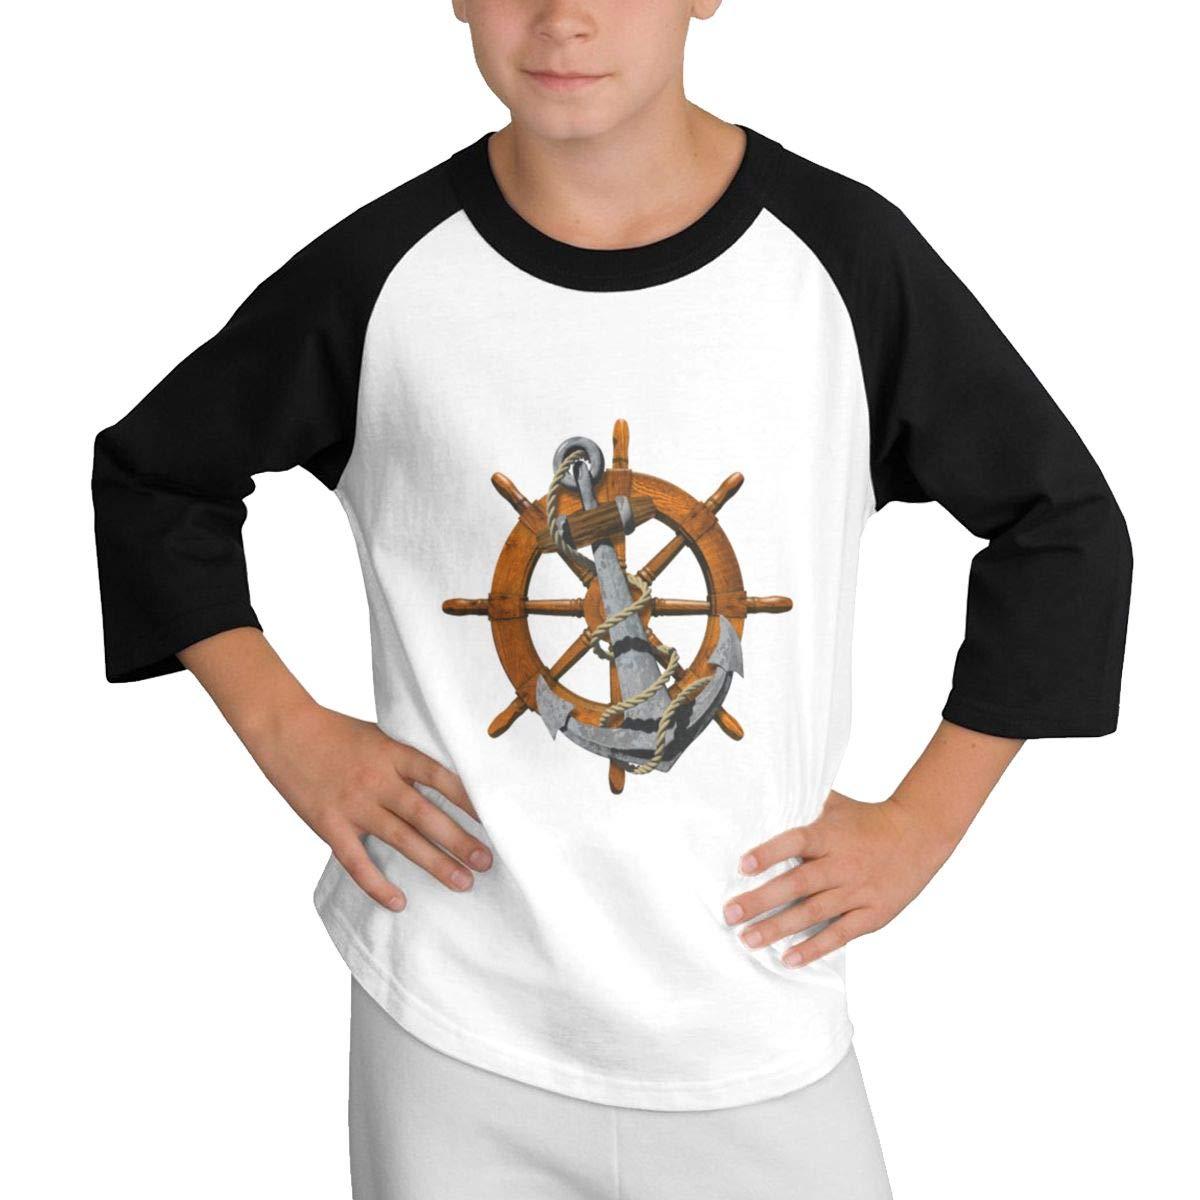 Anchor Wheel Raglan 3//4 Short-Sleeves Shirt Youth Girl Boys